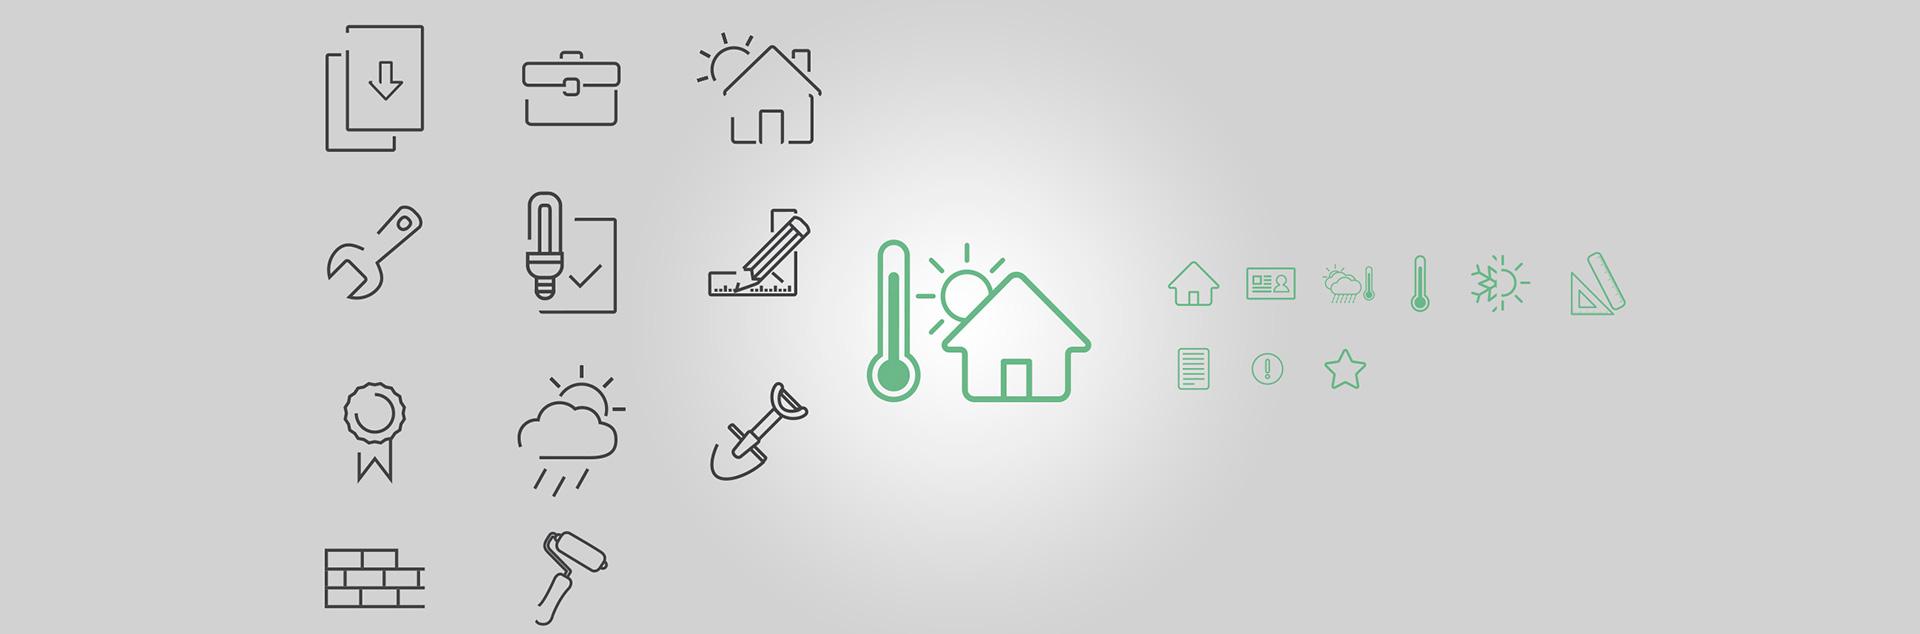 energycert custom made icons